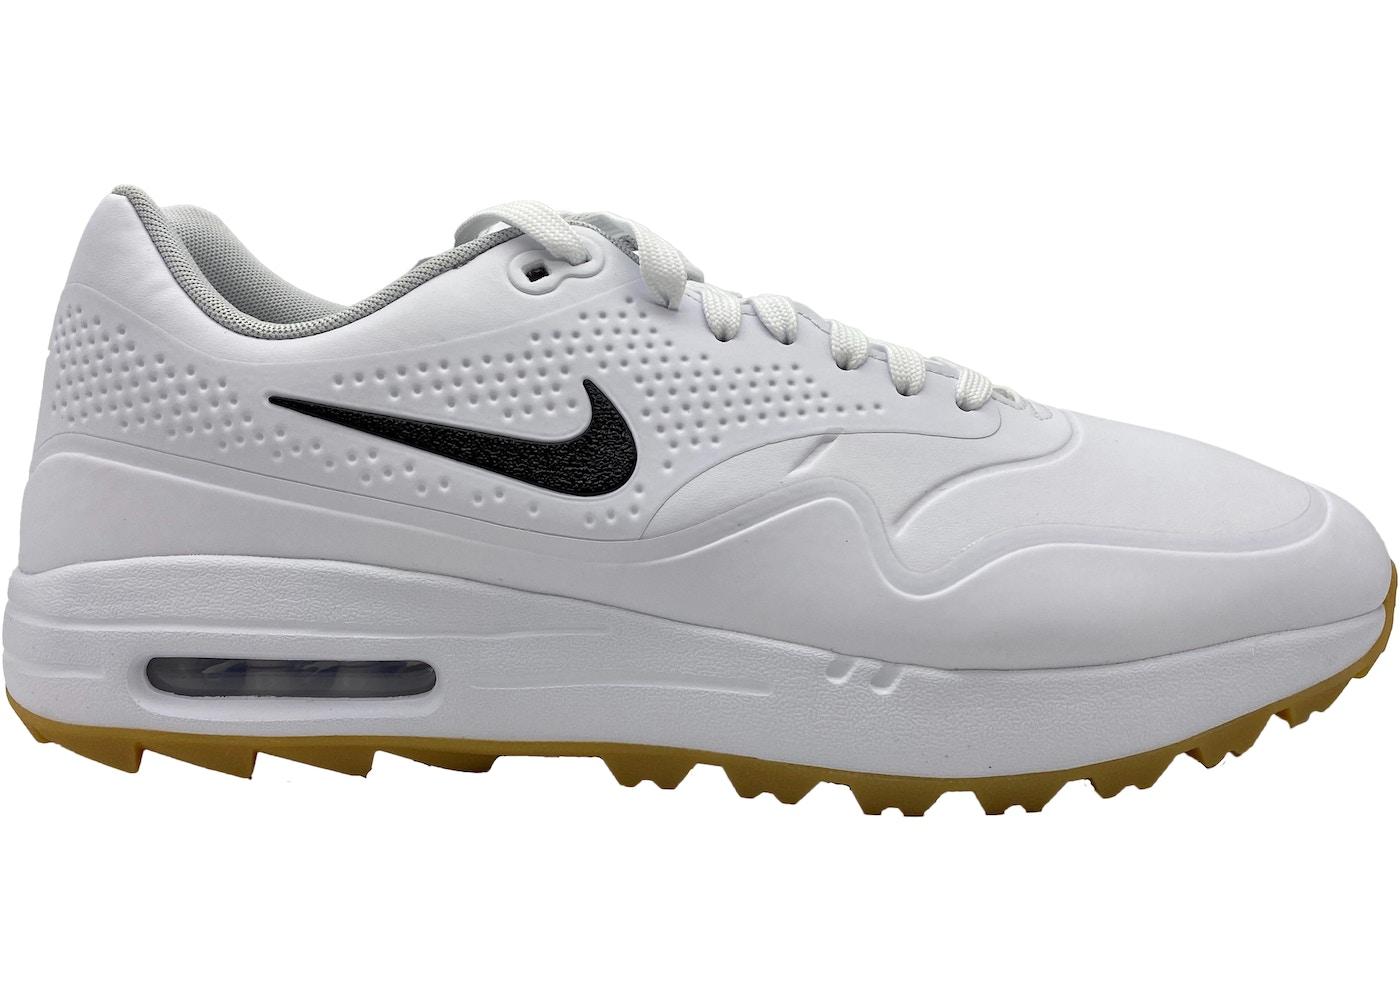 Air Max 1 Golf White Gum Black Swoosh Aq0863 101blackswoosh